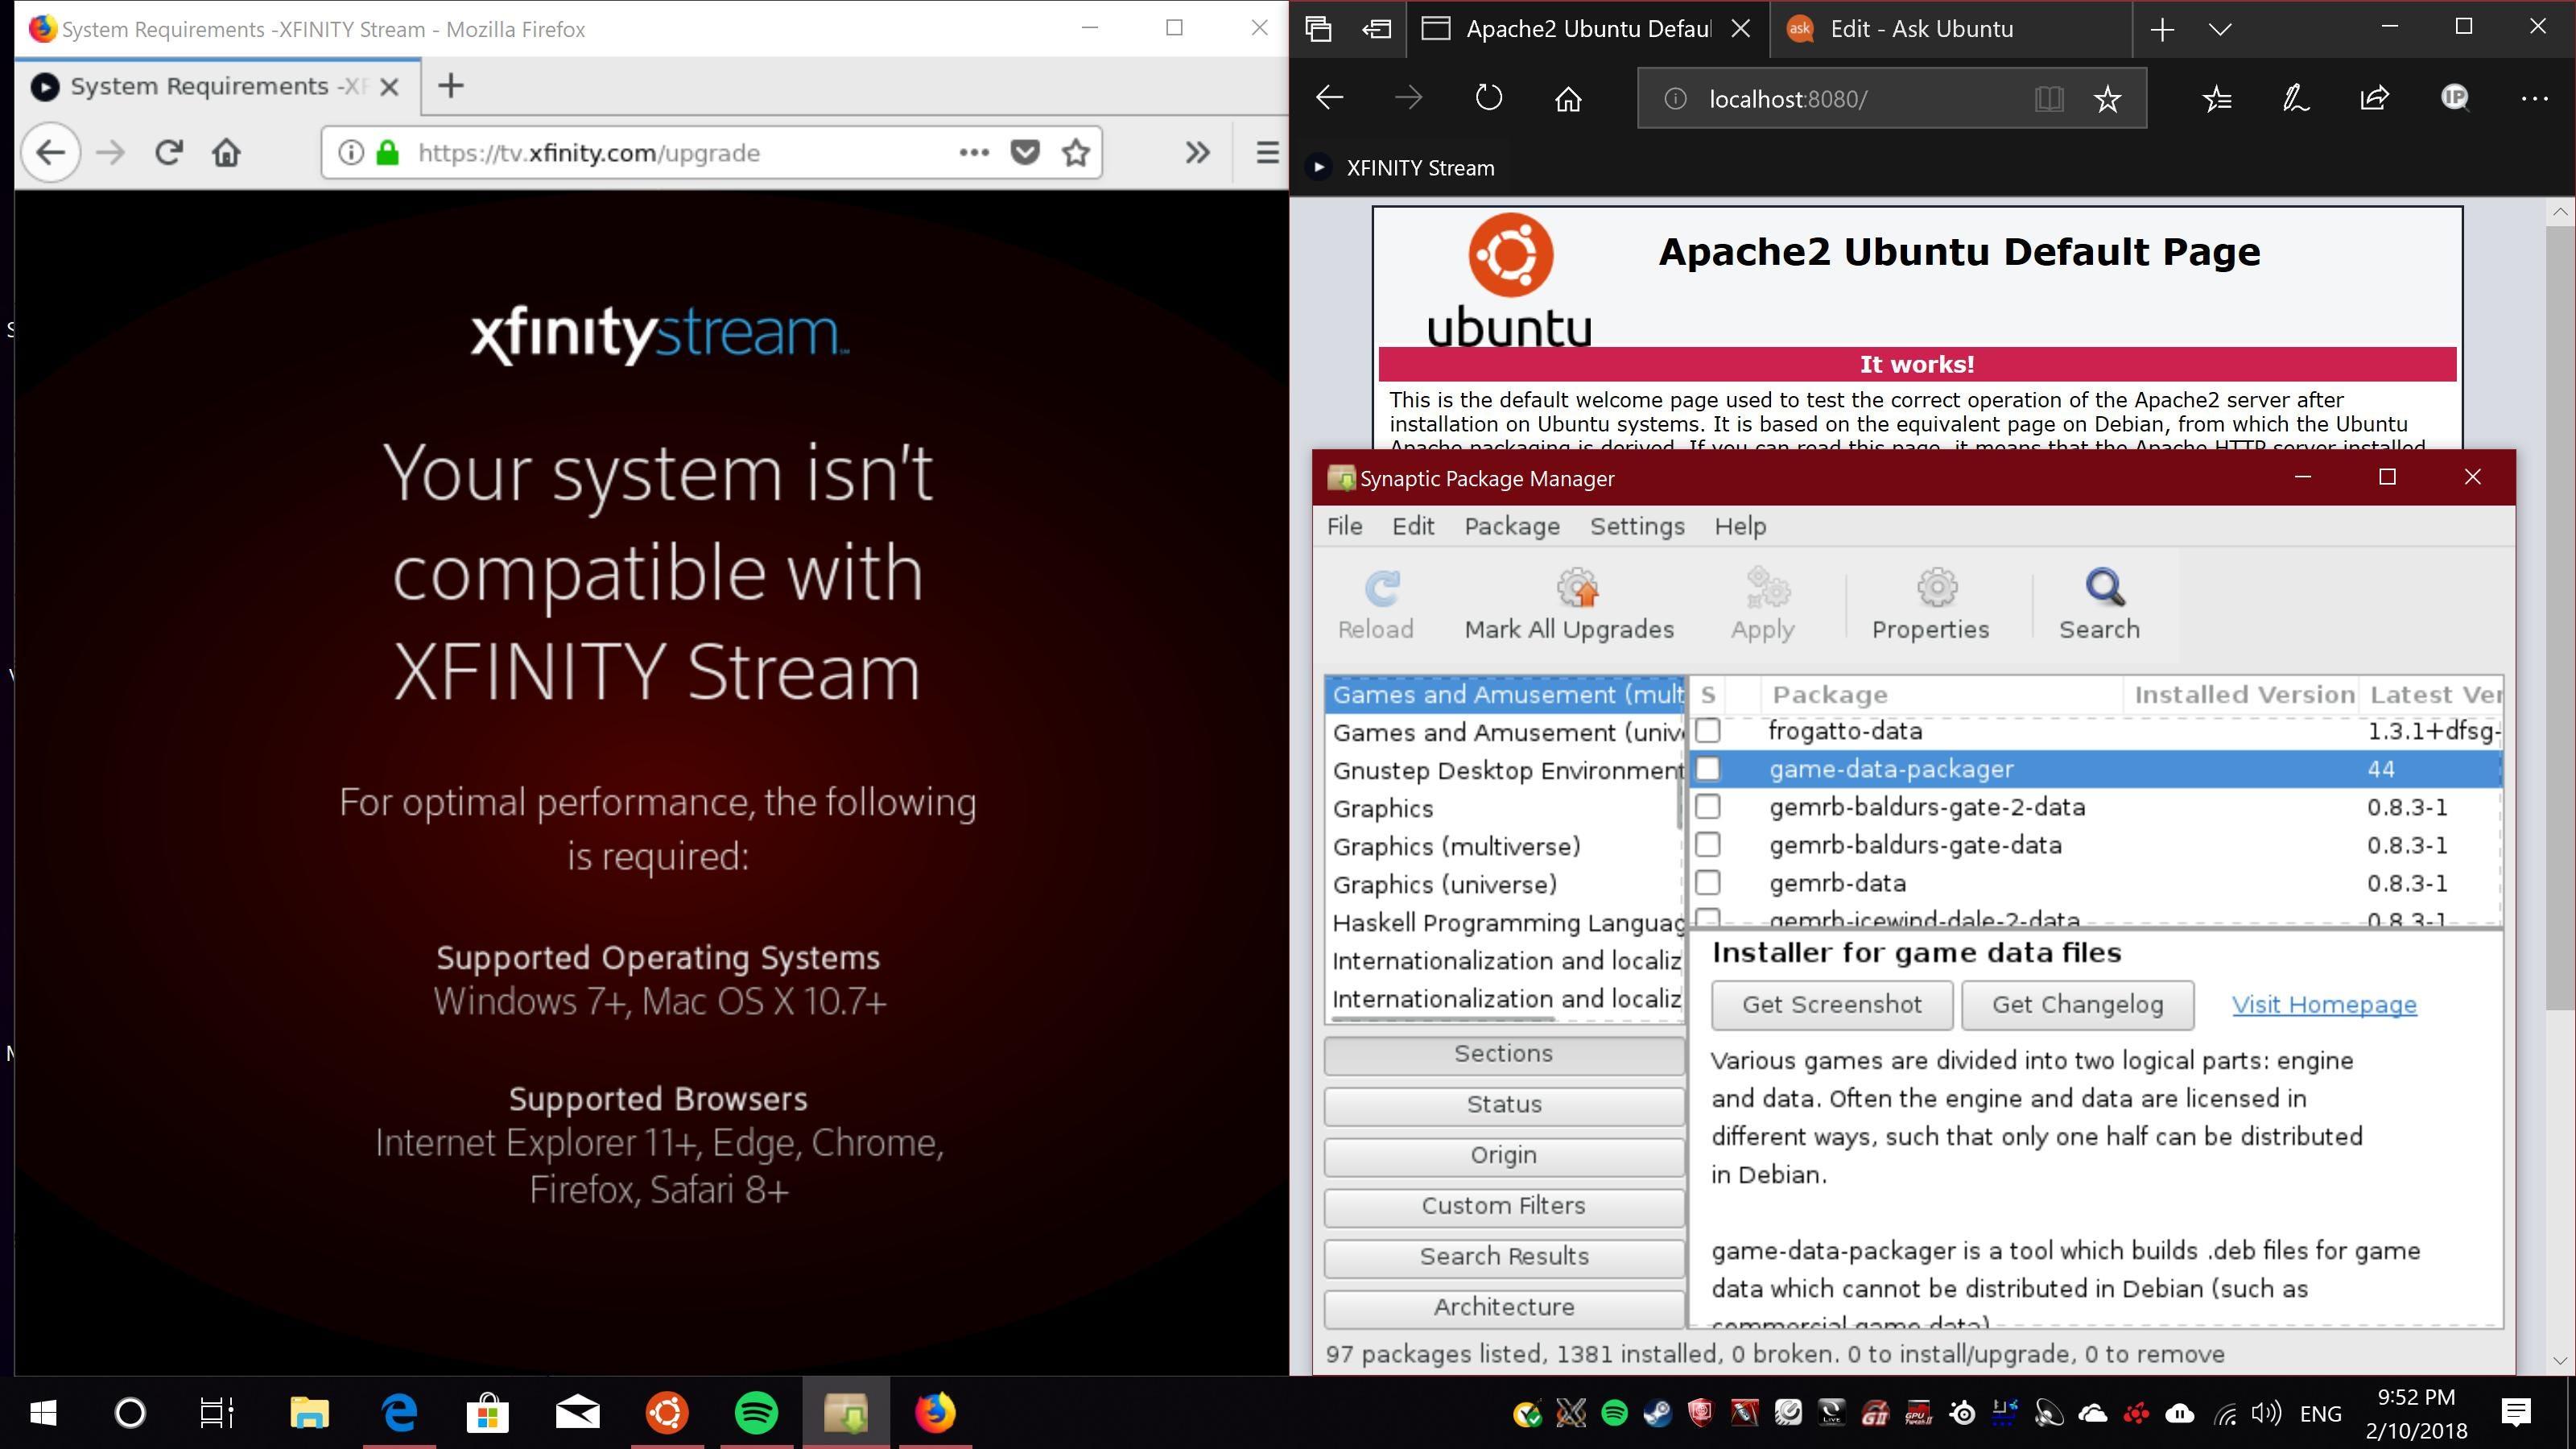 Windows Terminal and WSL: Microsoft ️ Linux | by Ethan Roberts | Medium